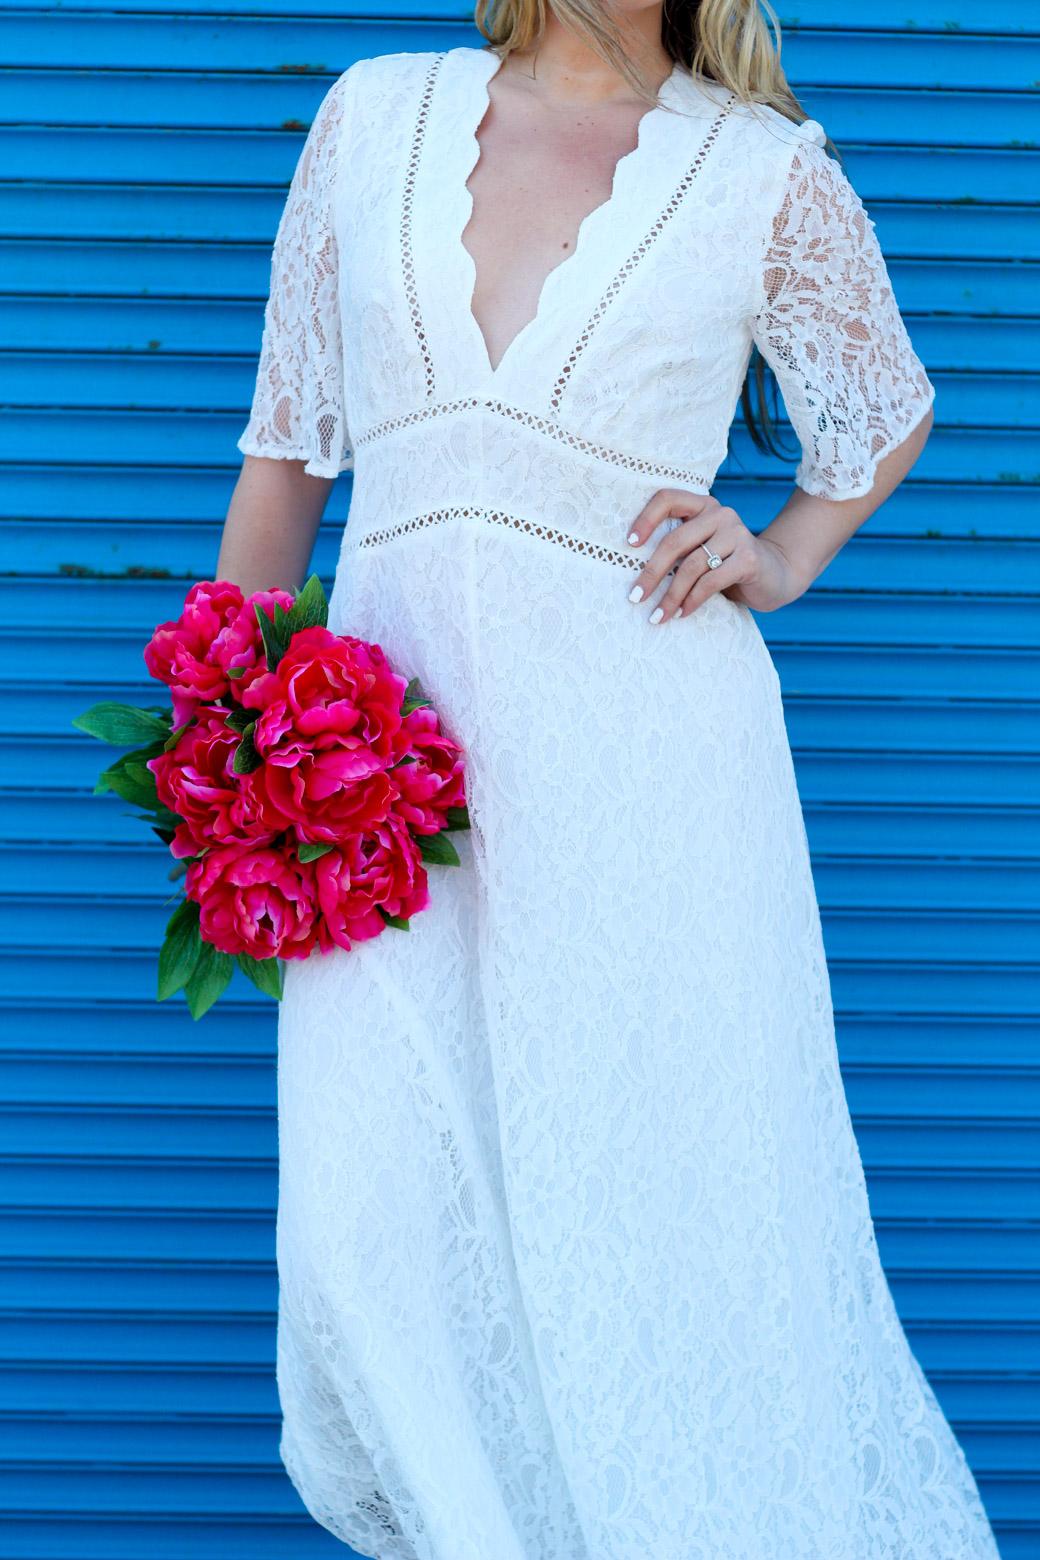 modcloth-wedding-dress-chicago-fashion-blogger-13